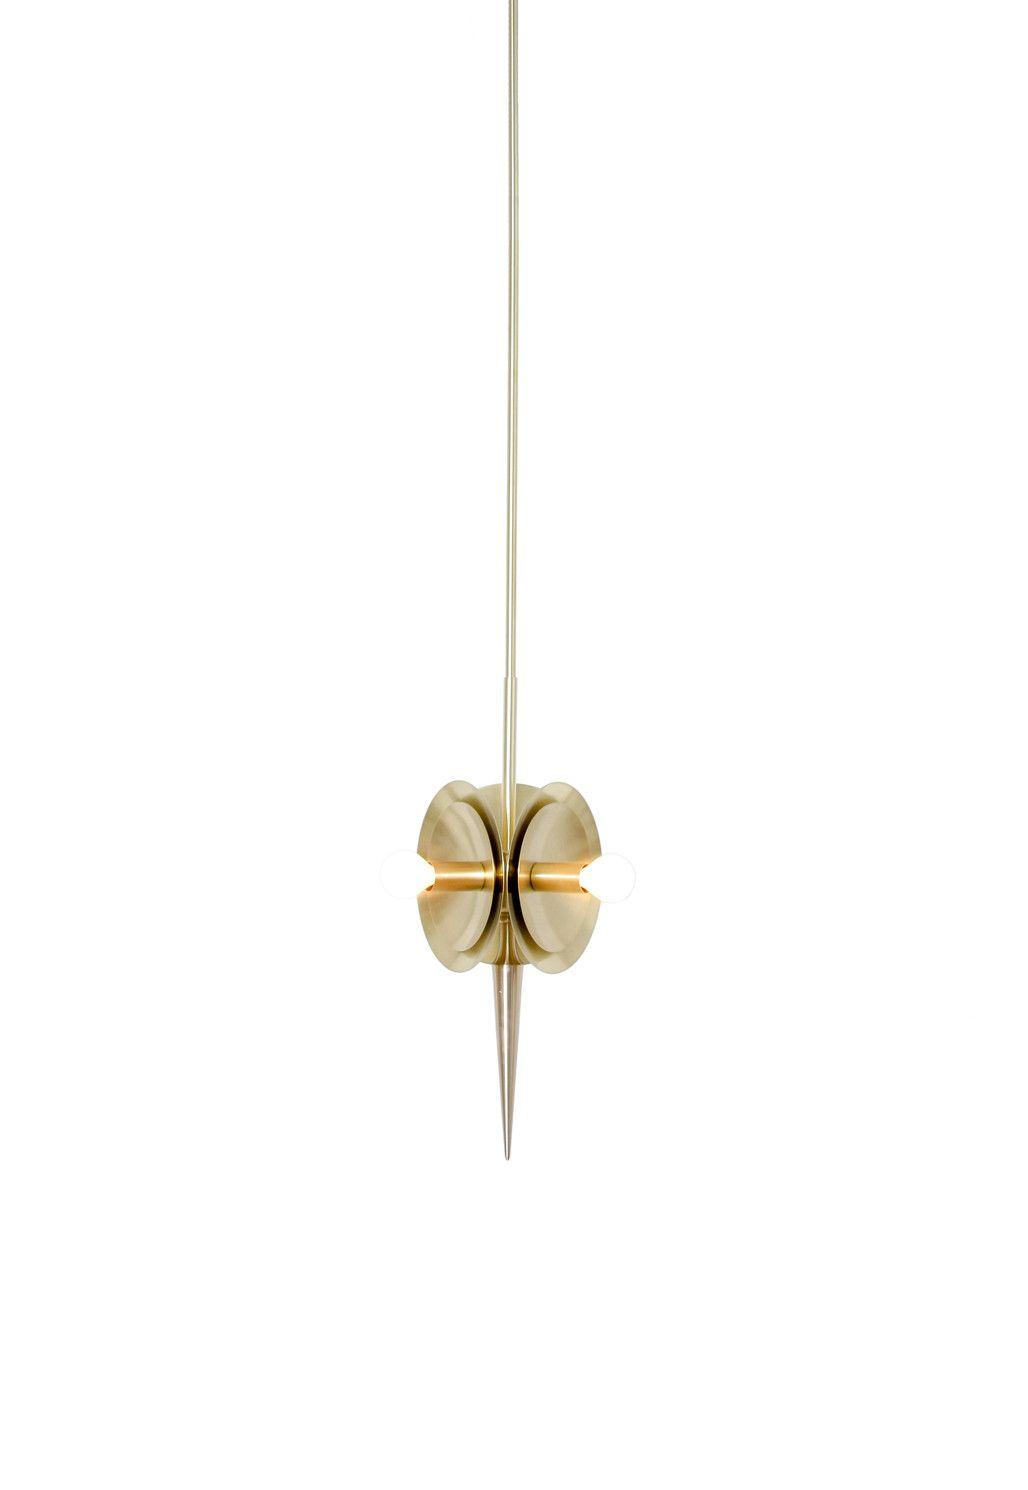 Consort / Concentric No. 3 pendant